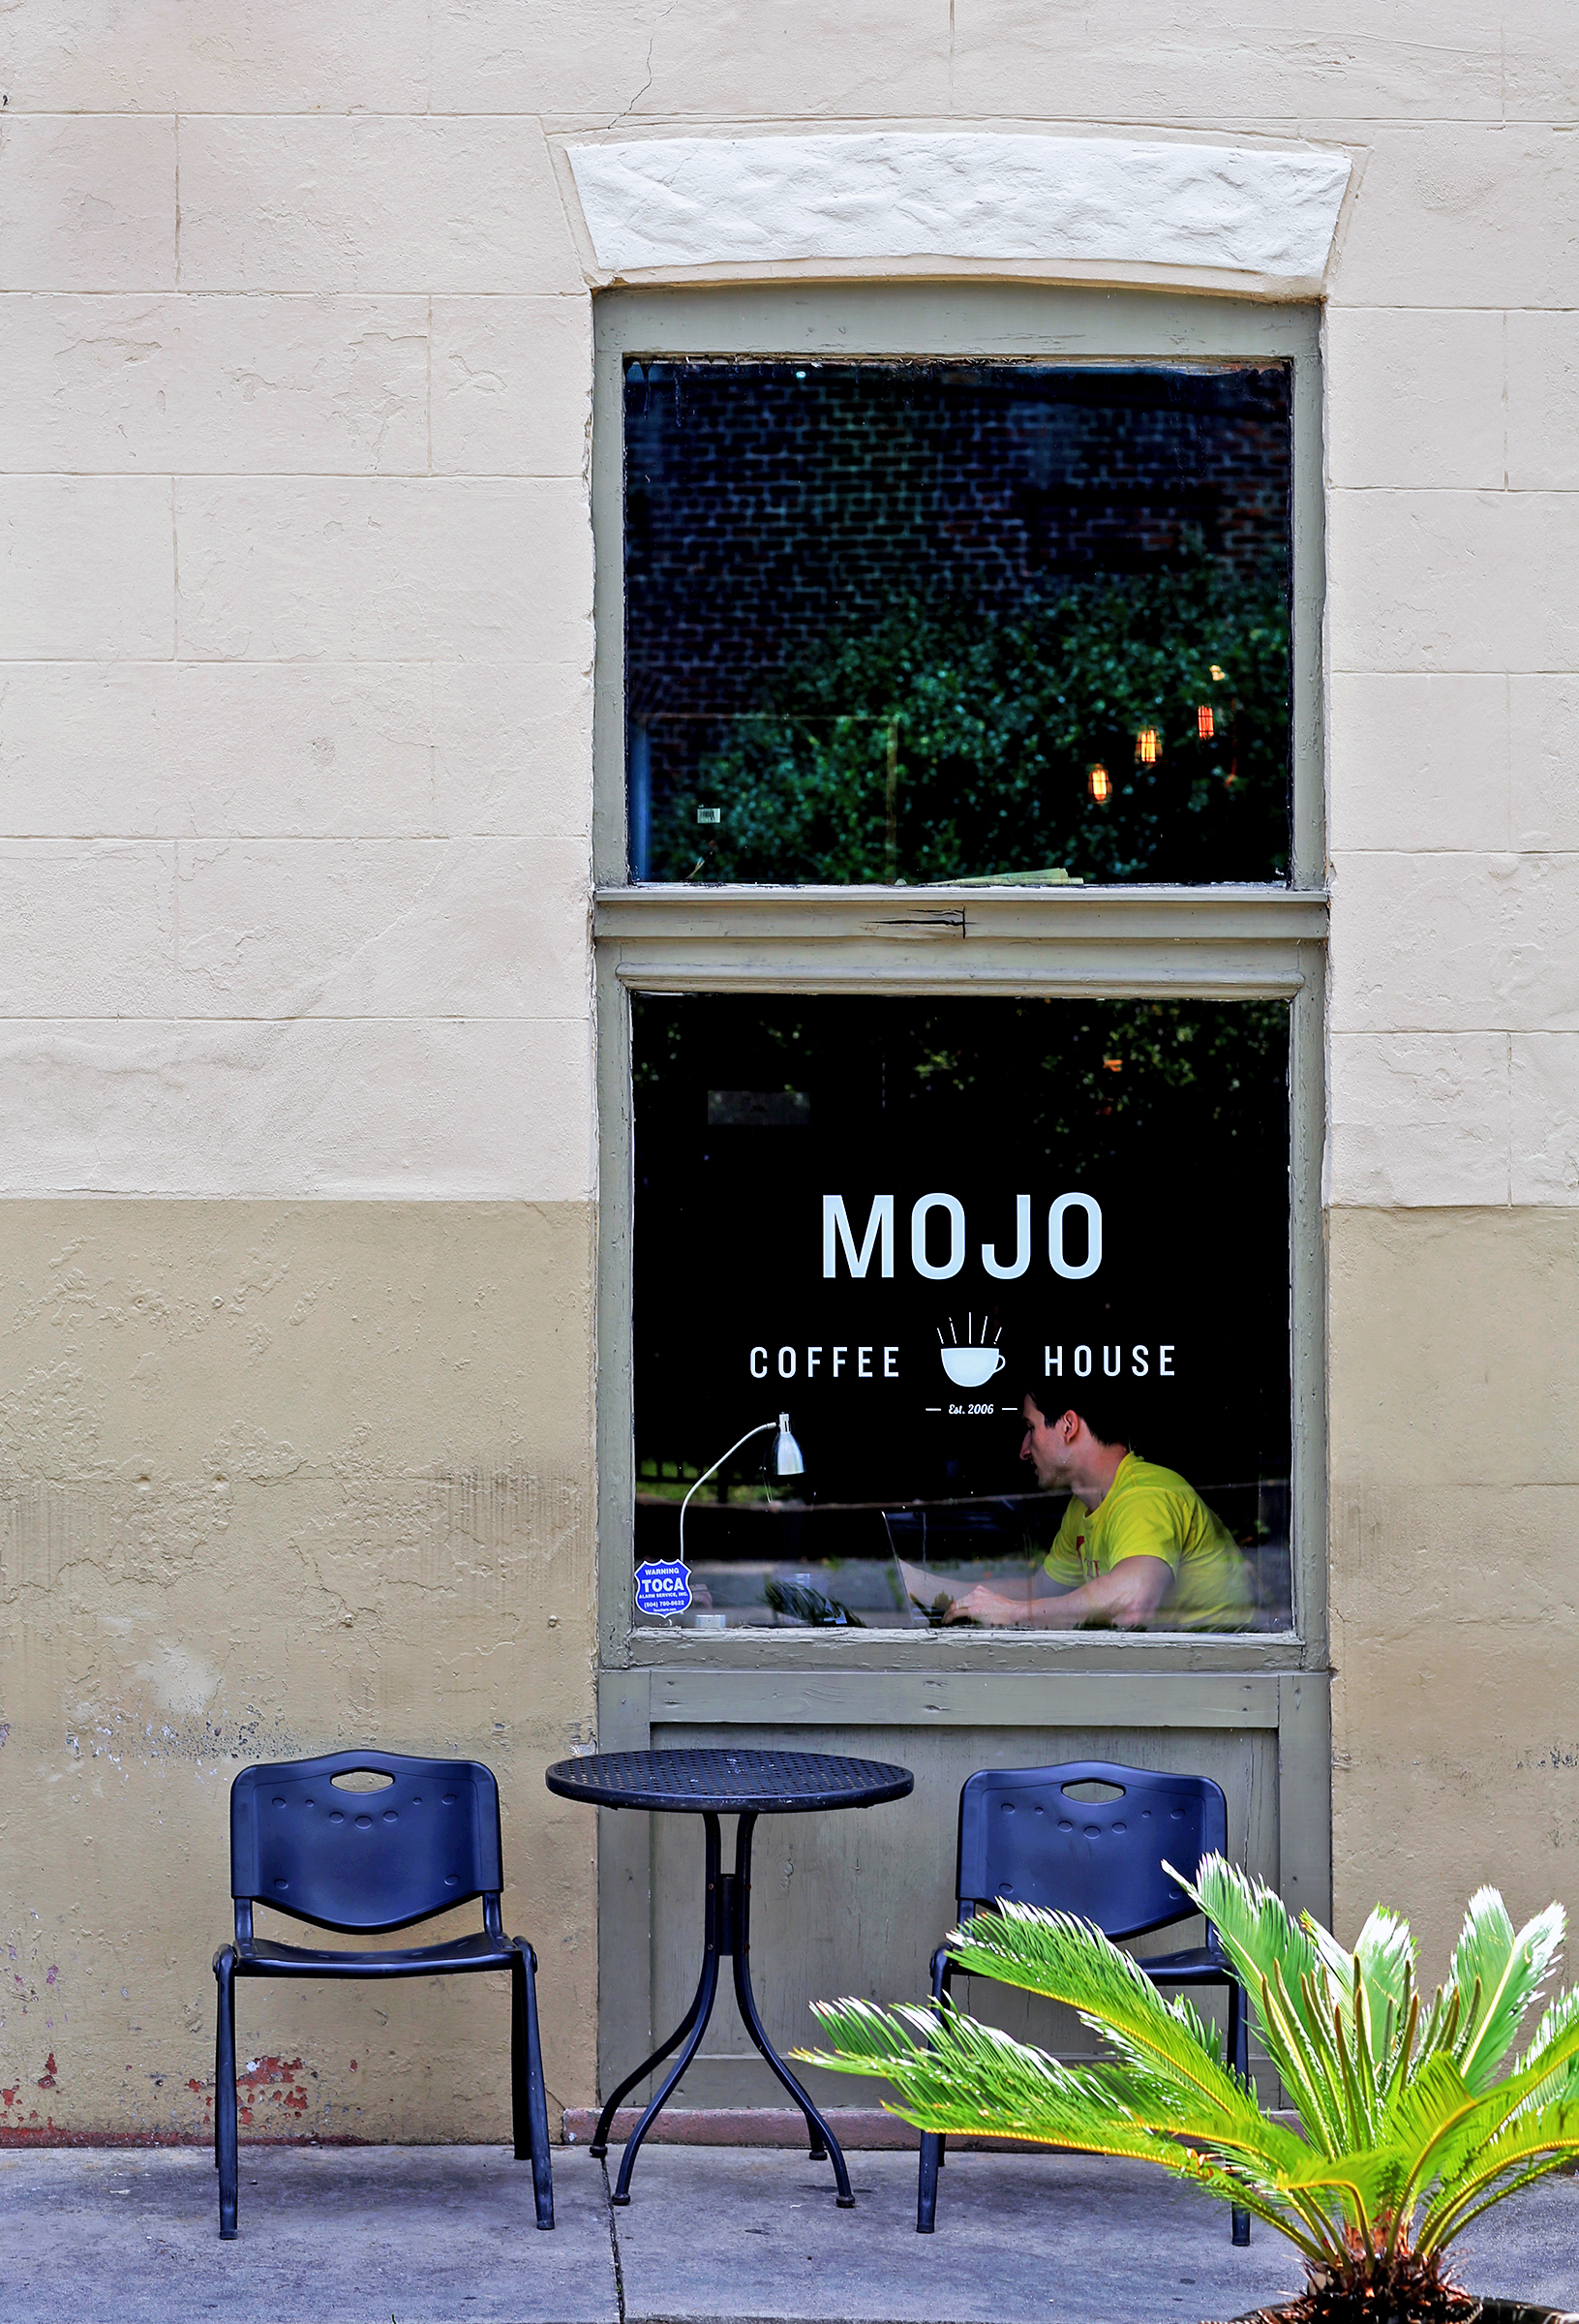 mojo-coffee-house-exterior-2.jpg